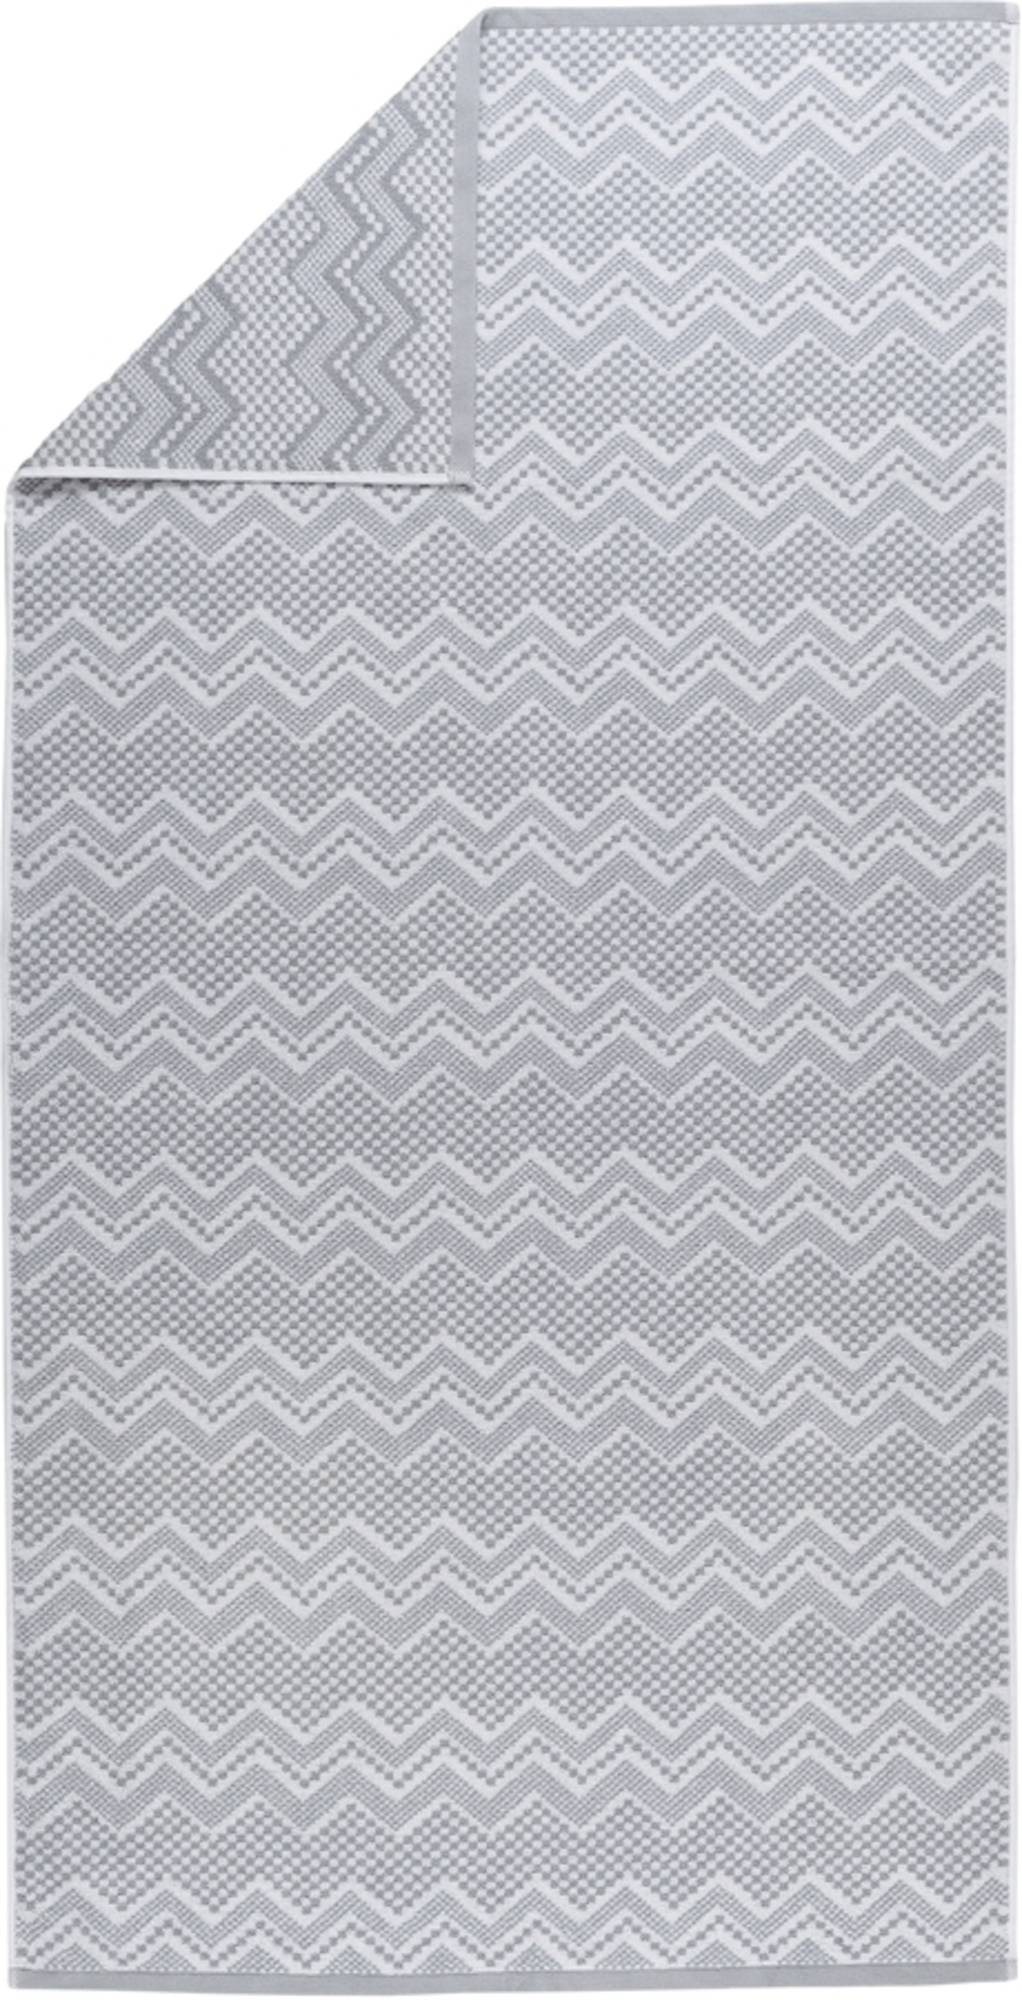 Sealskin Brilliance Portofino Handdoek 70 x 140 cm